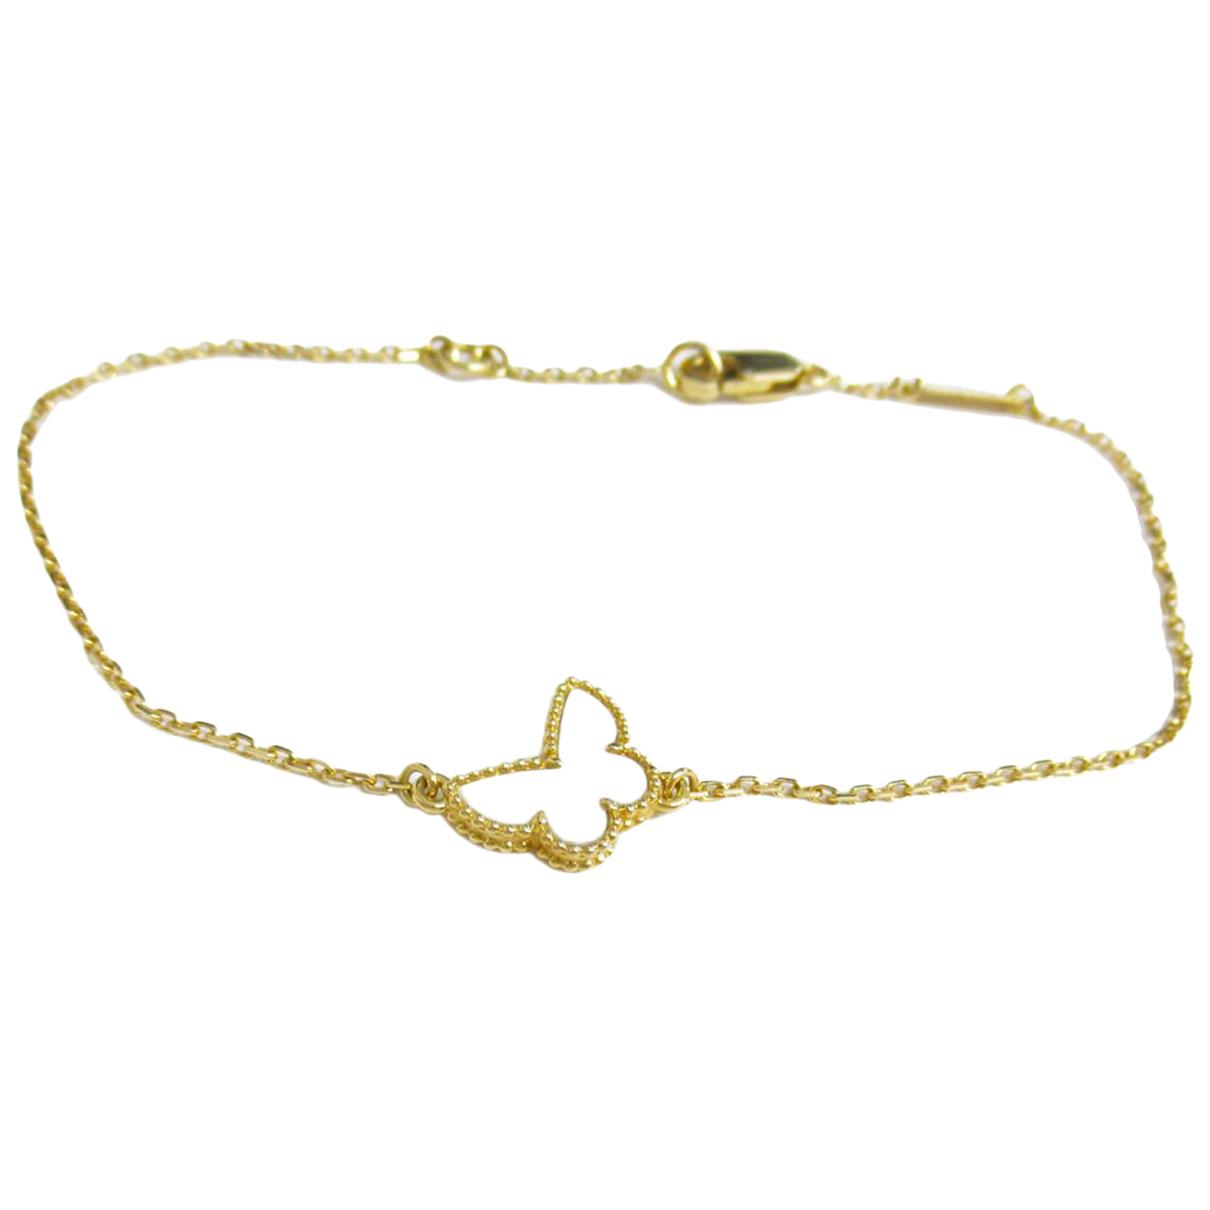 Van Cleef & Arpels Sweet Alhambra Armband in  Gelb Gelbgold